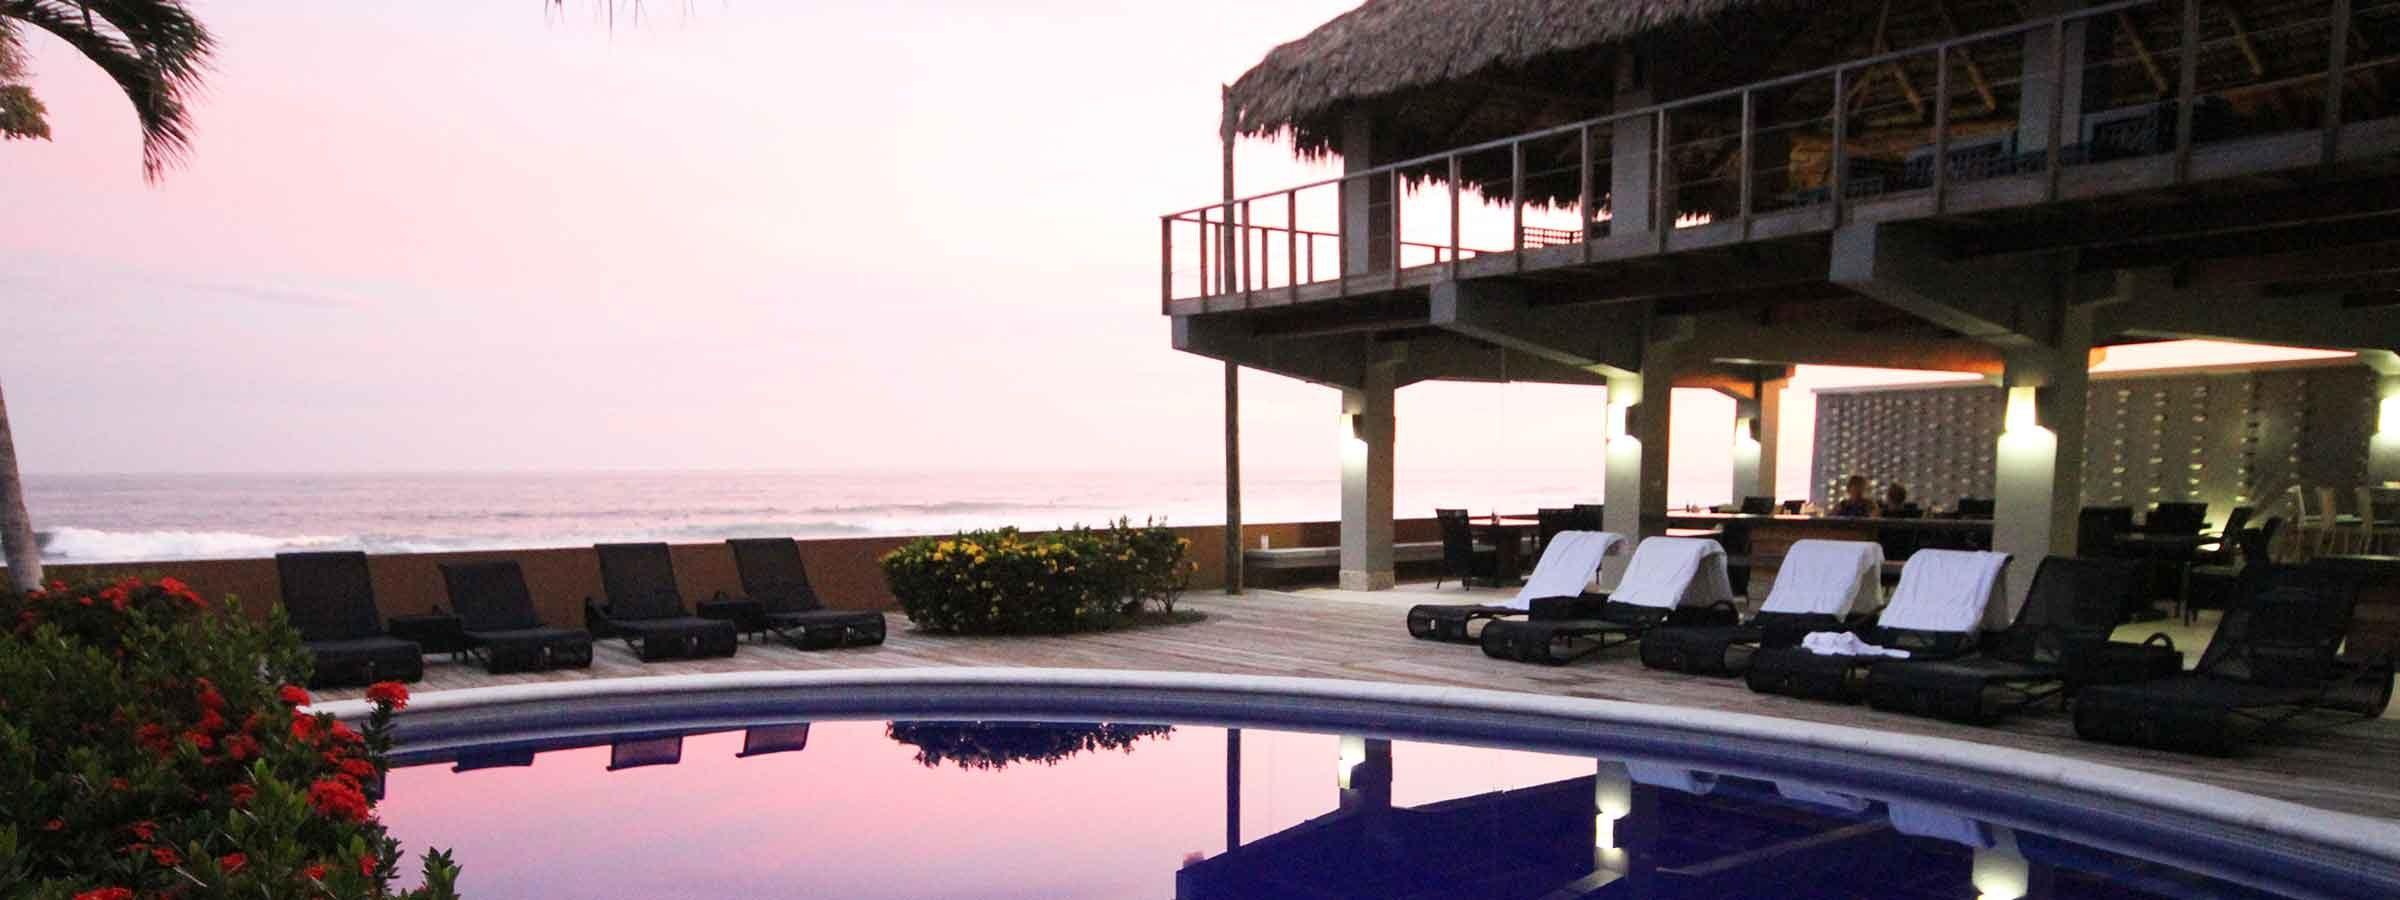 Hotel Casa De Mar El Salvador